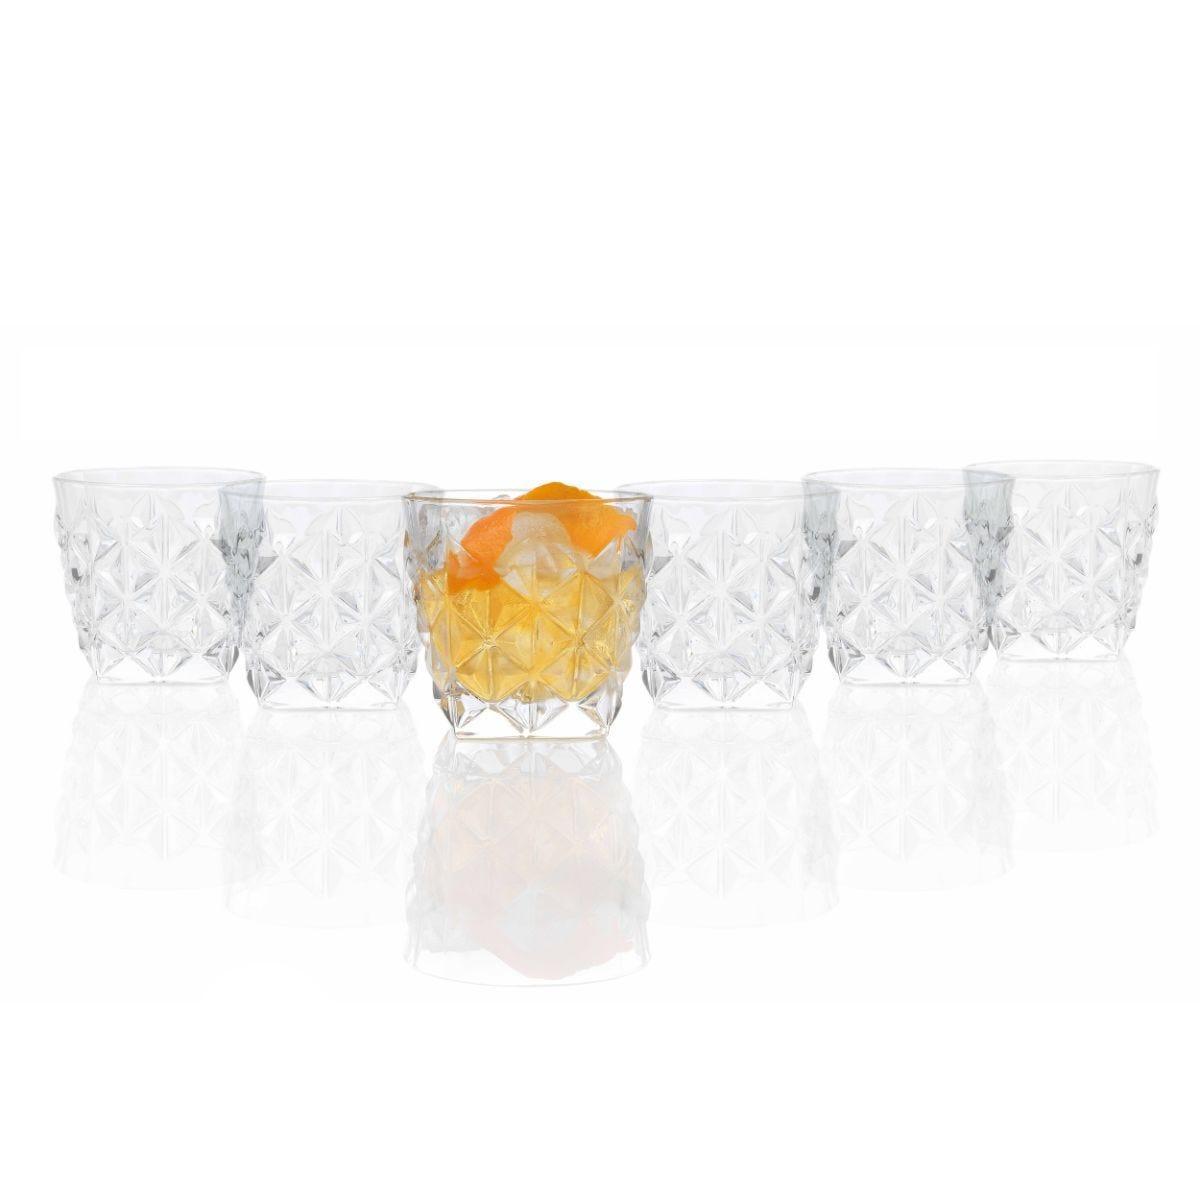 RCR Enigma Whisky Tumblers 370ml - Set of 6